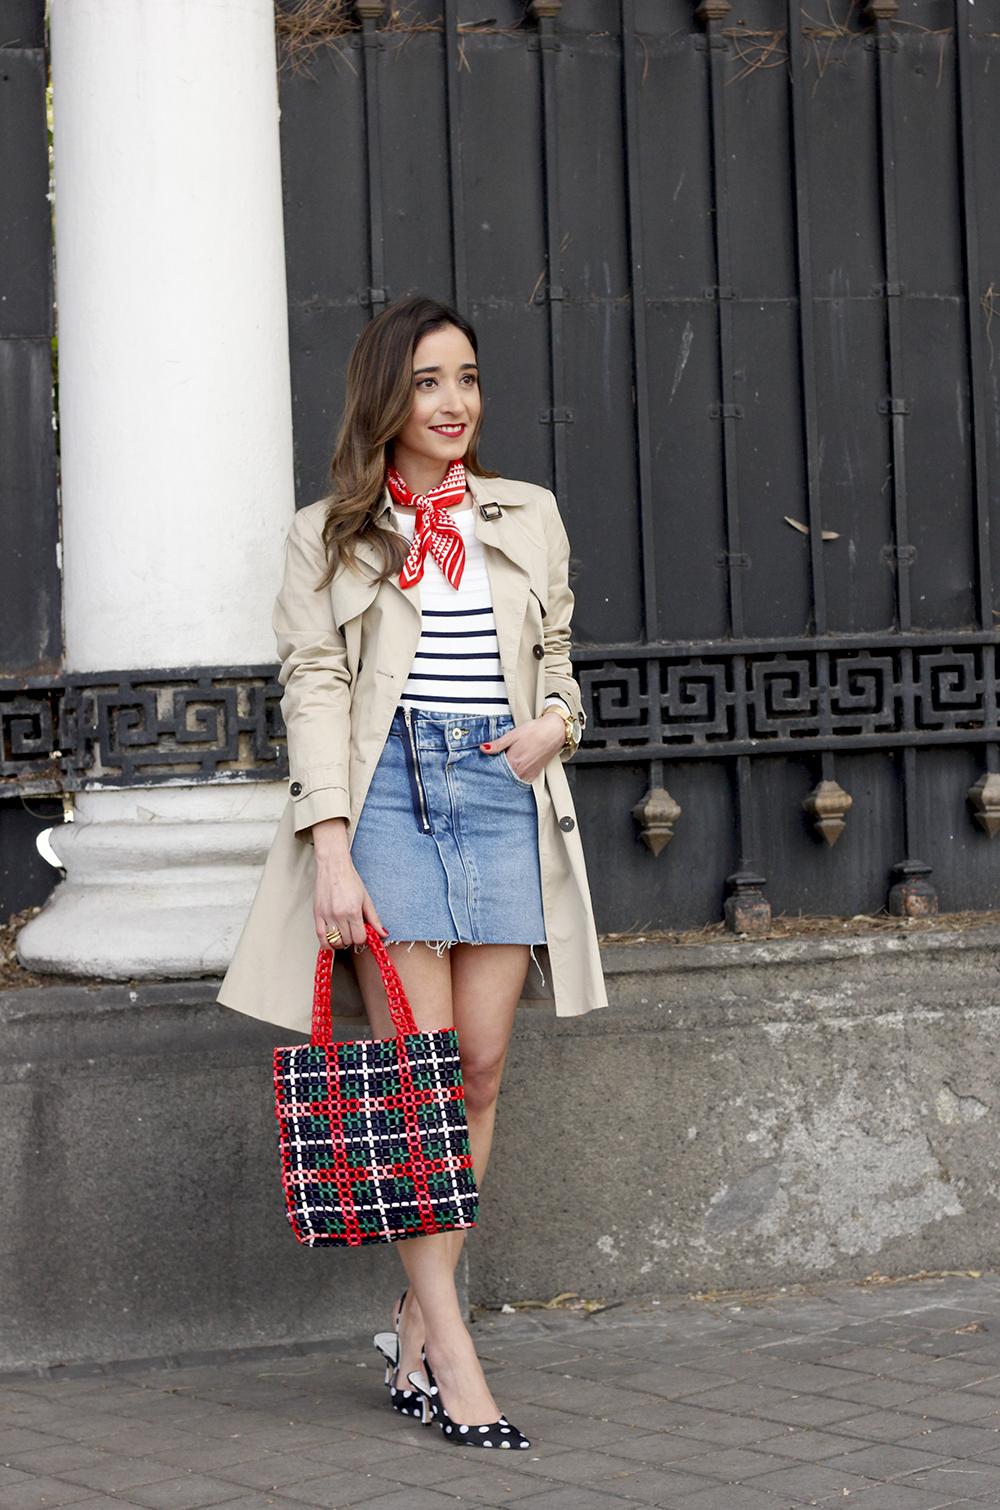 trench outfit denim skirt kitten heels striped sweater spring 05